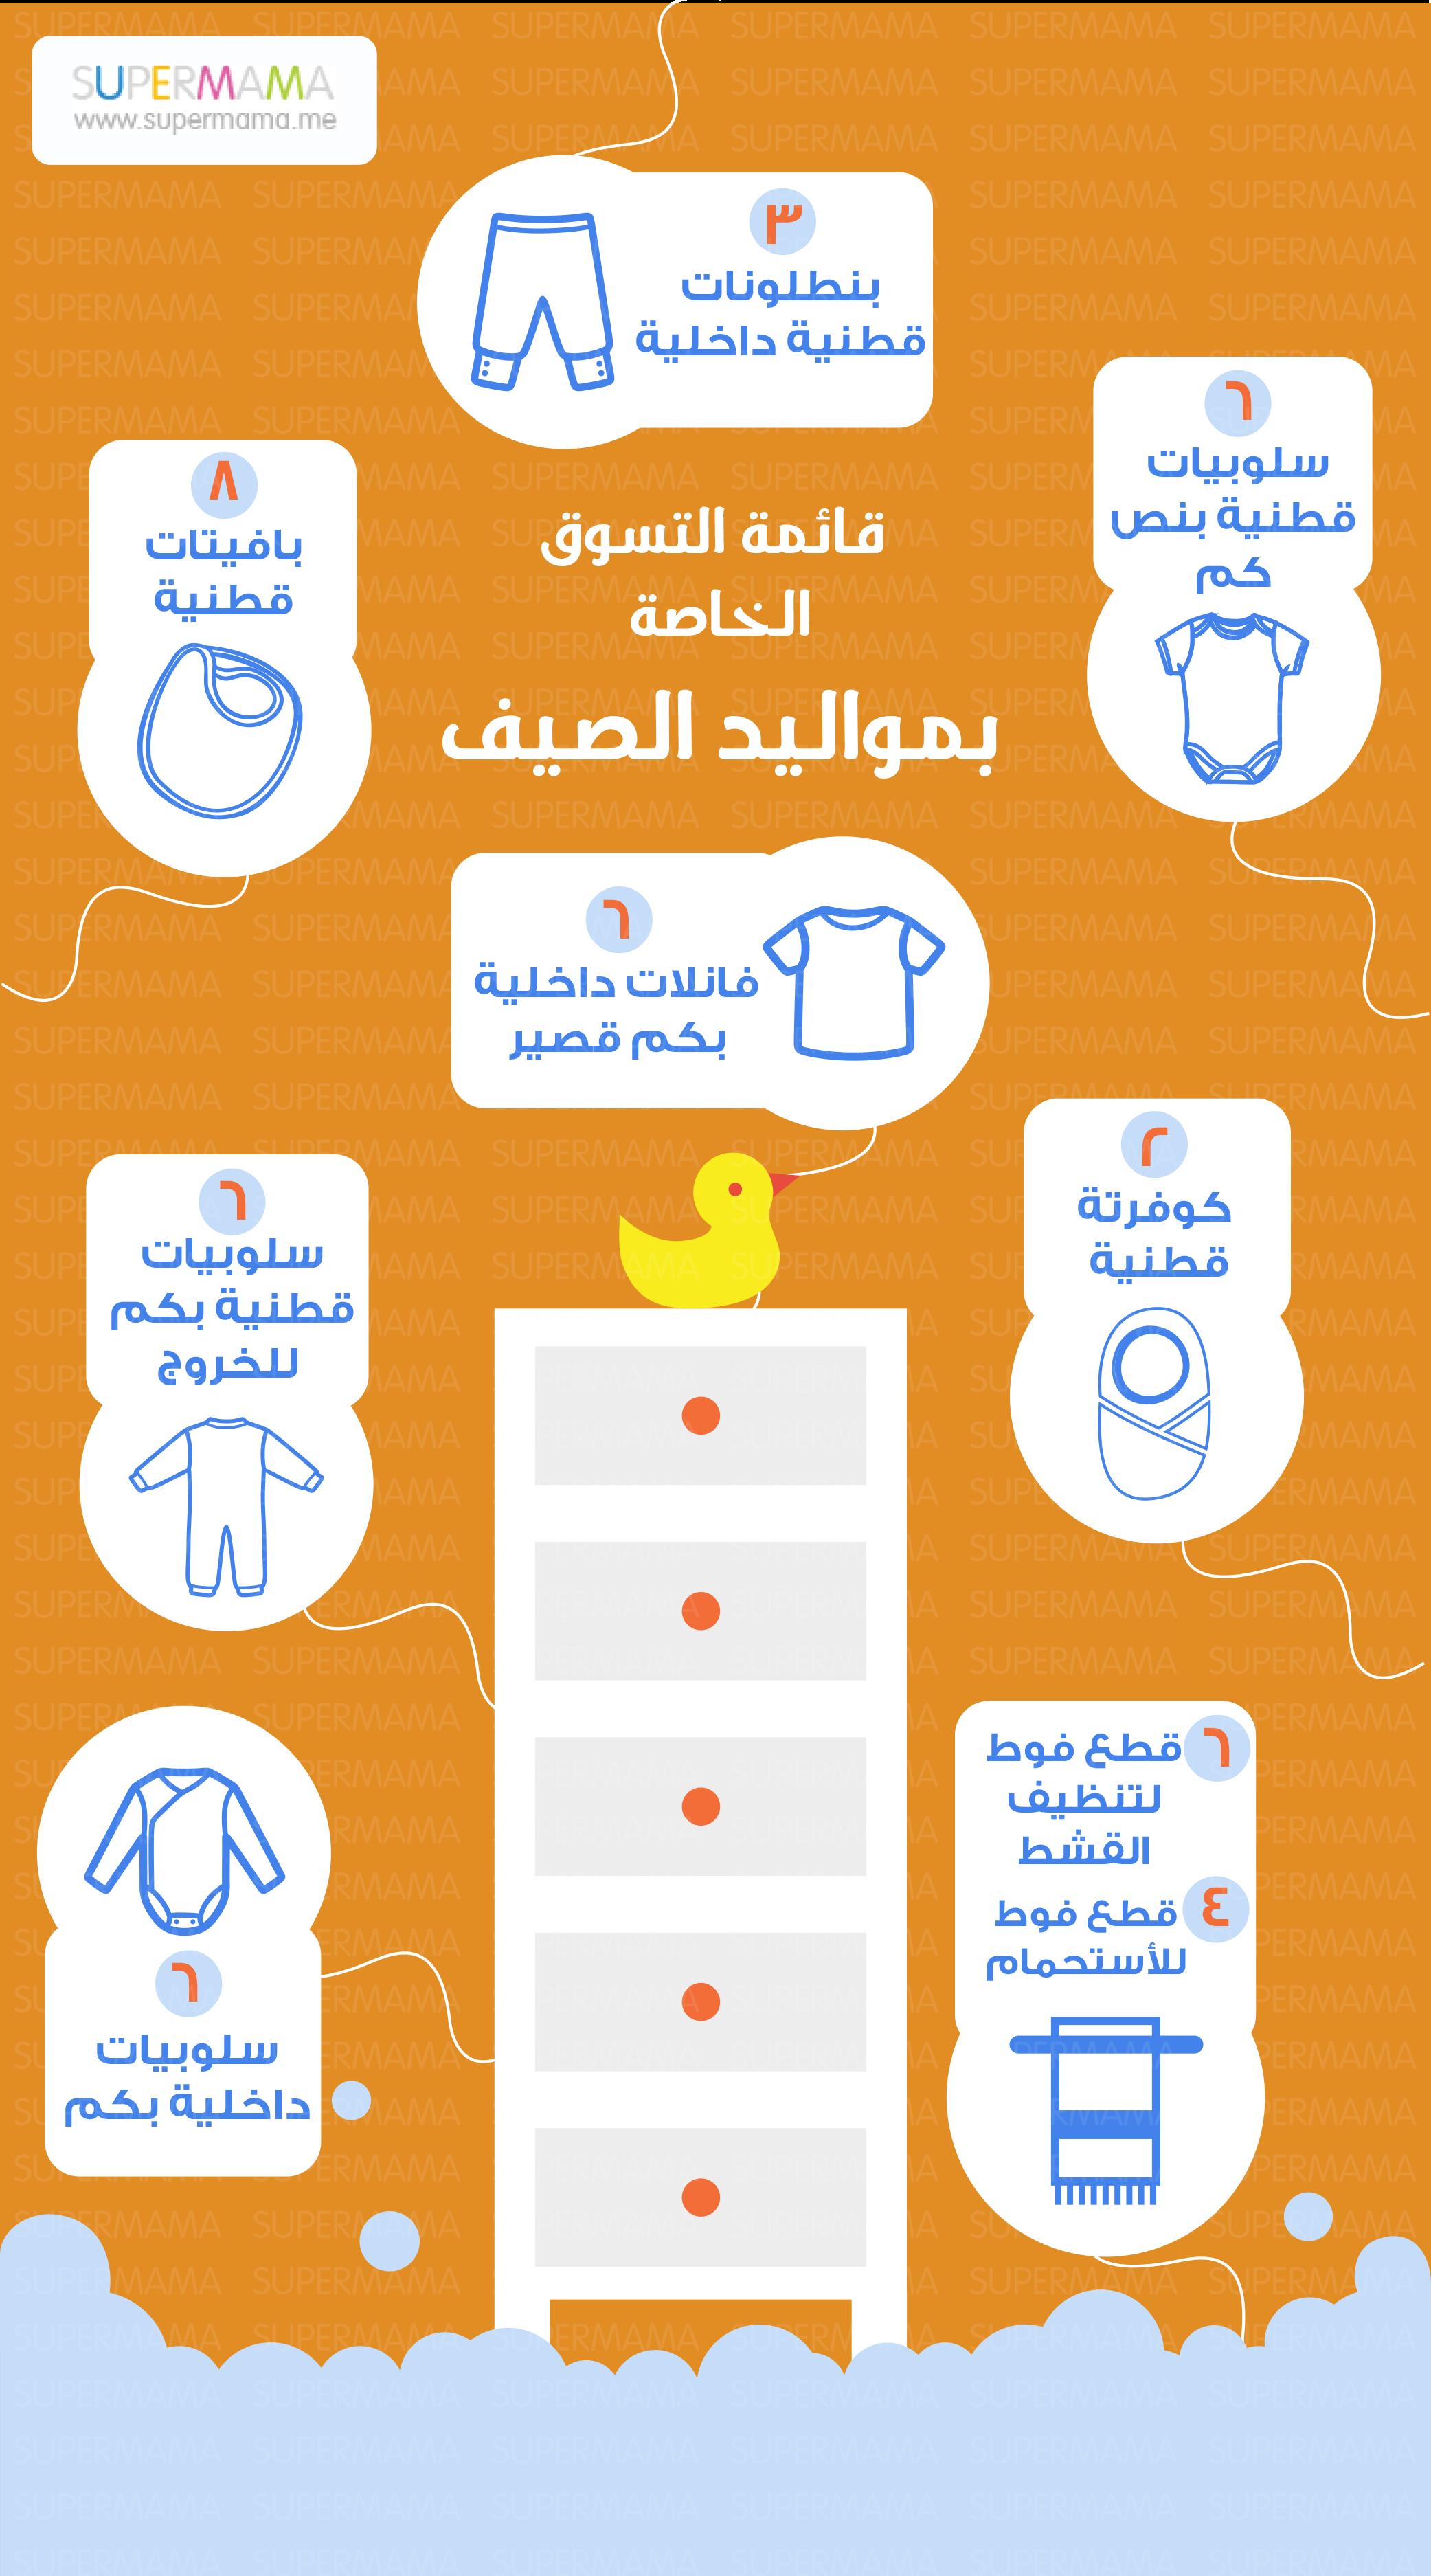 d356a31ba شاهدي قائمة احتياجات البيبي المولود في الصيف مع أم العيال: